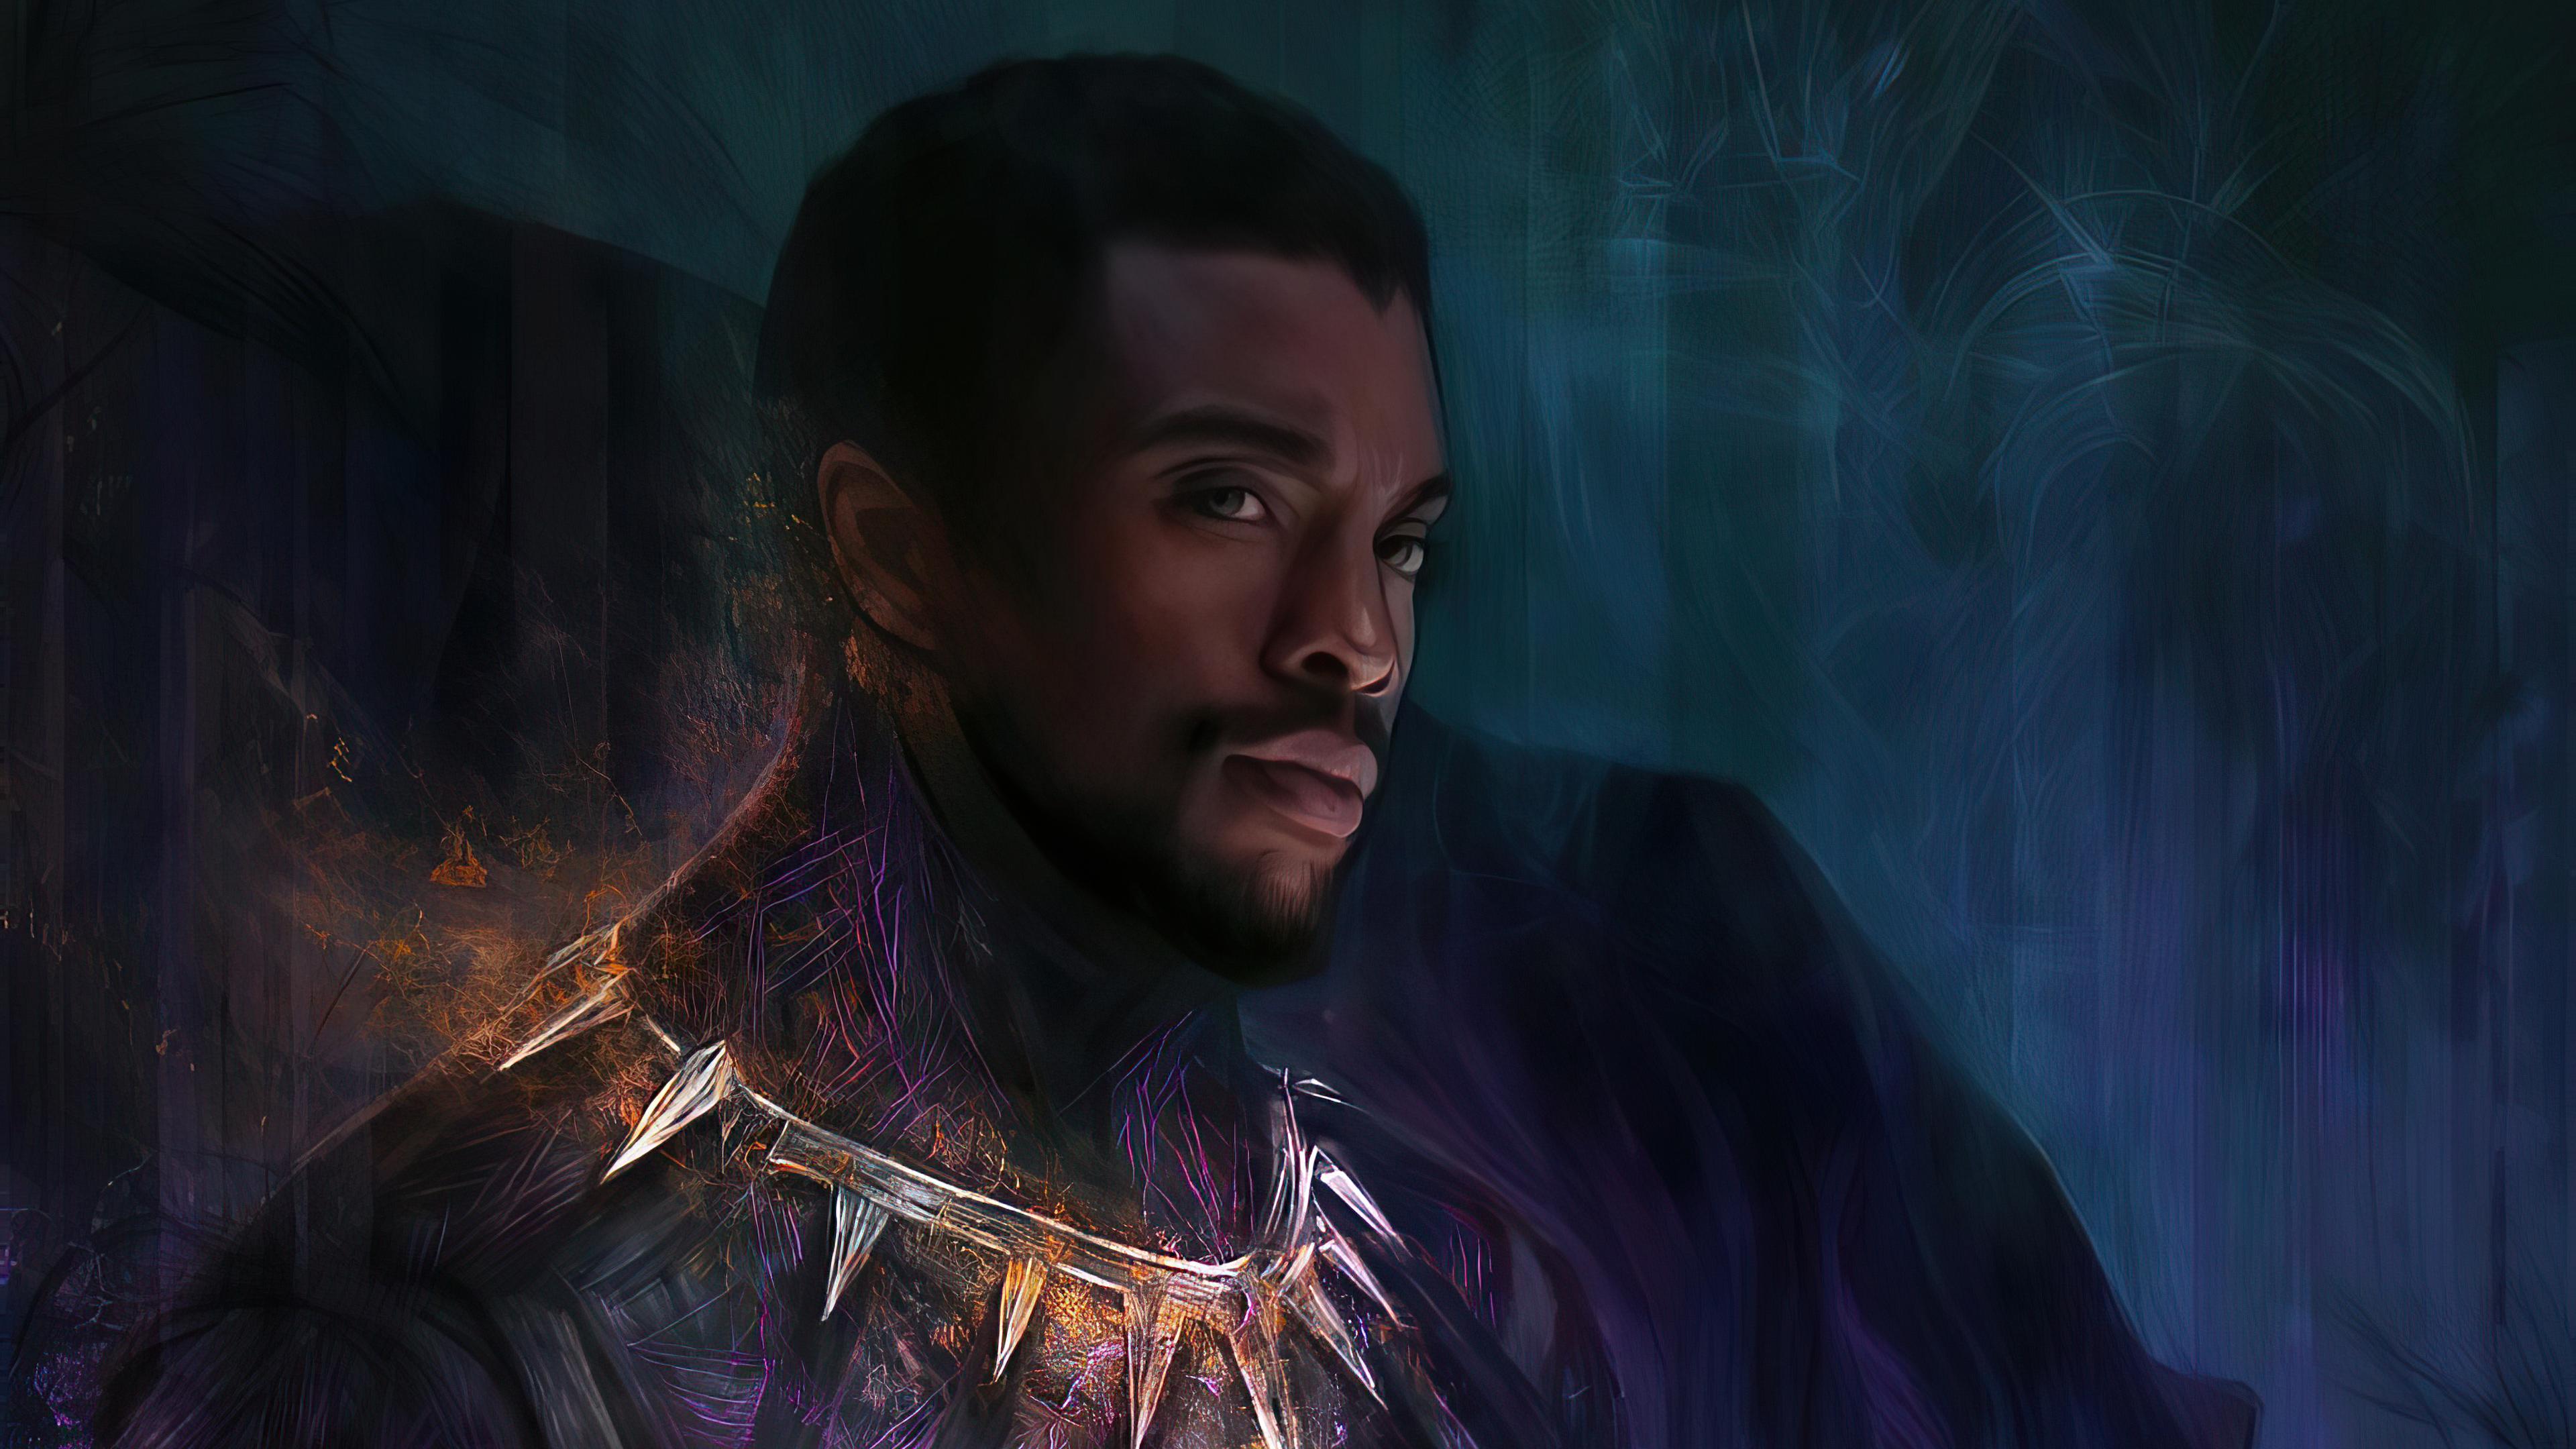 Fondos de pantalla Chadwick Boseman como Pantera Negra 2020 Fanart